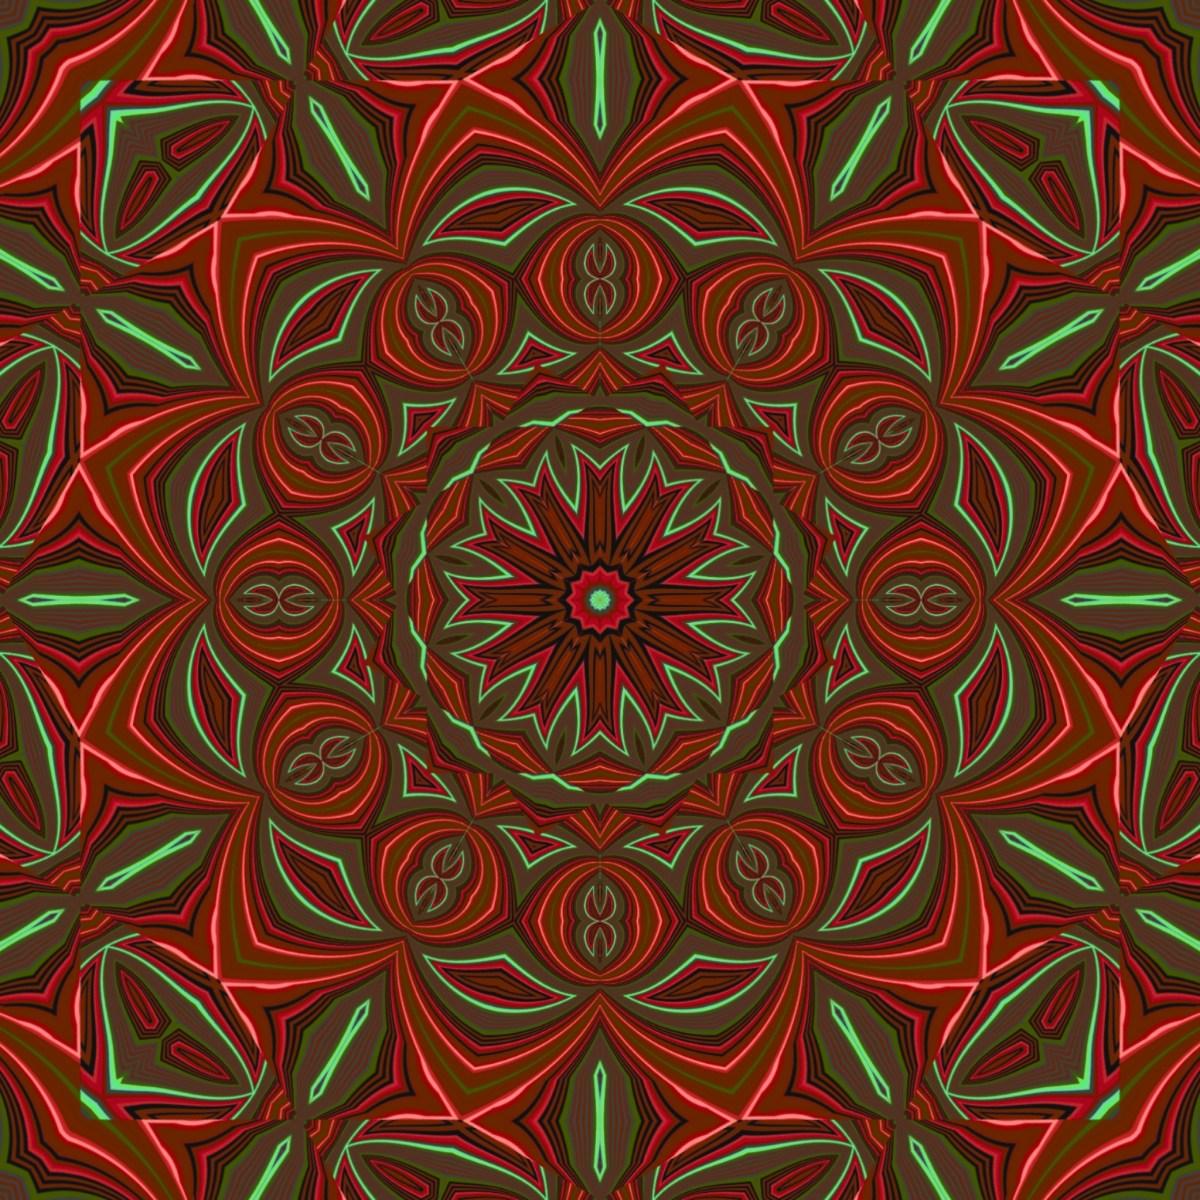 Kalidoscopic Neon Eye glitch art